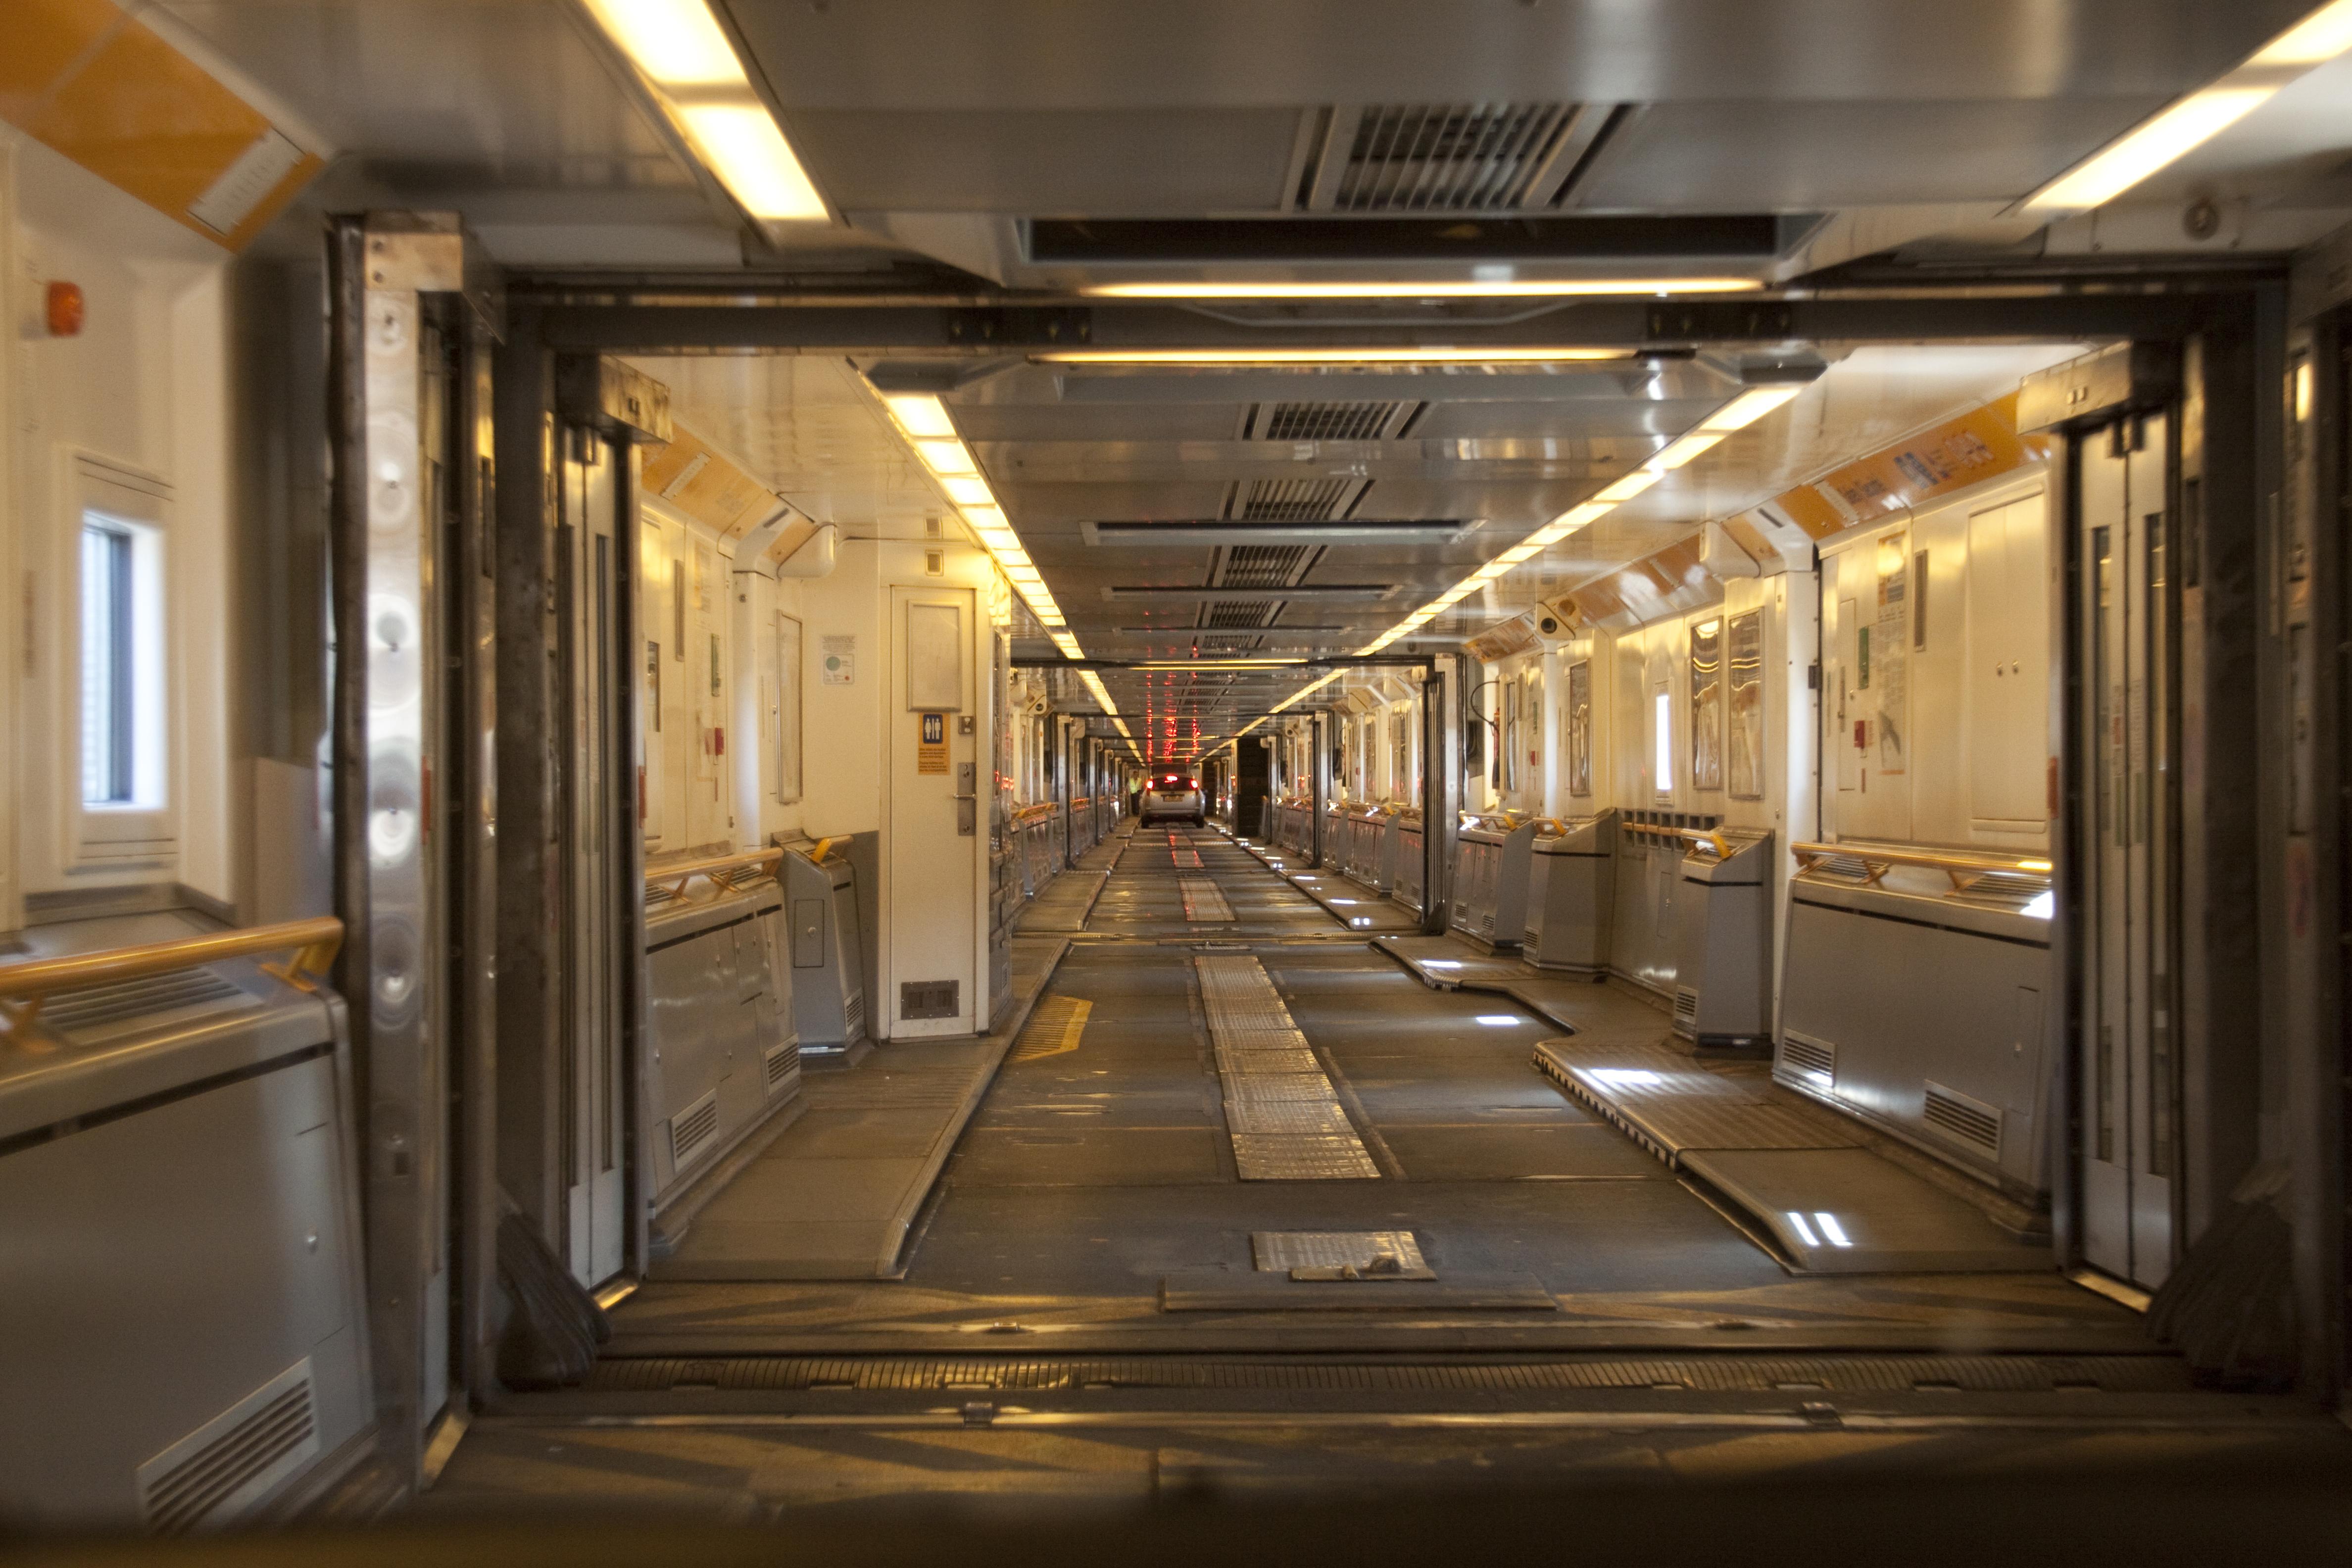 Space Shuttle Interior Car Shuttle Interior Jpg